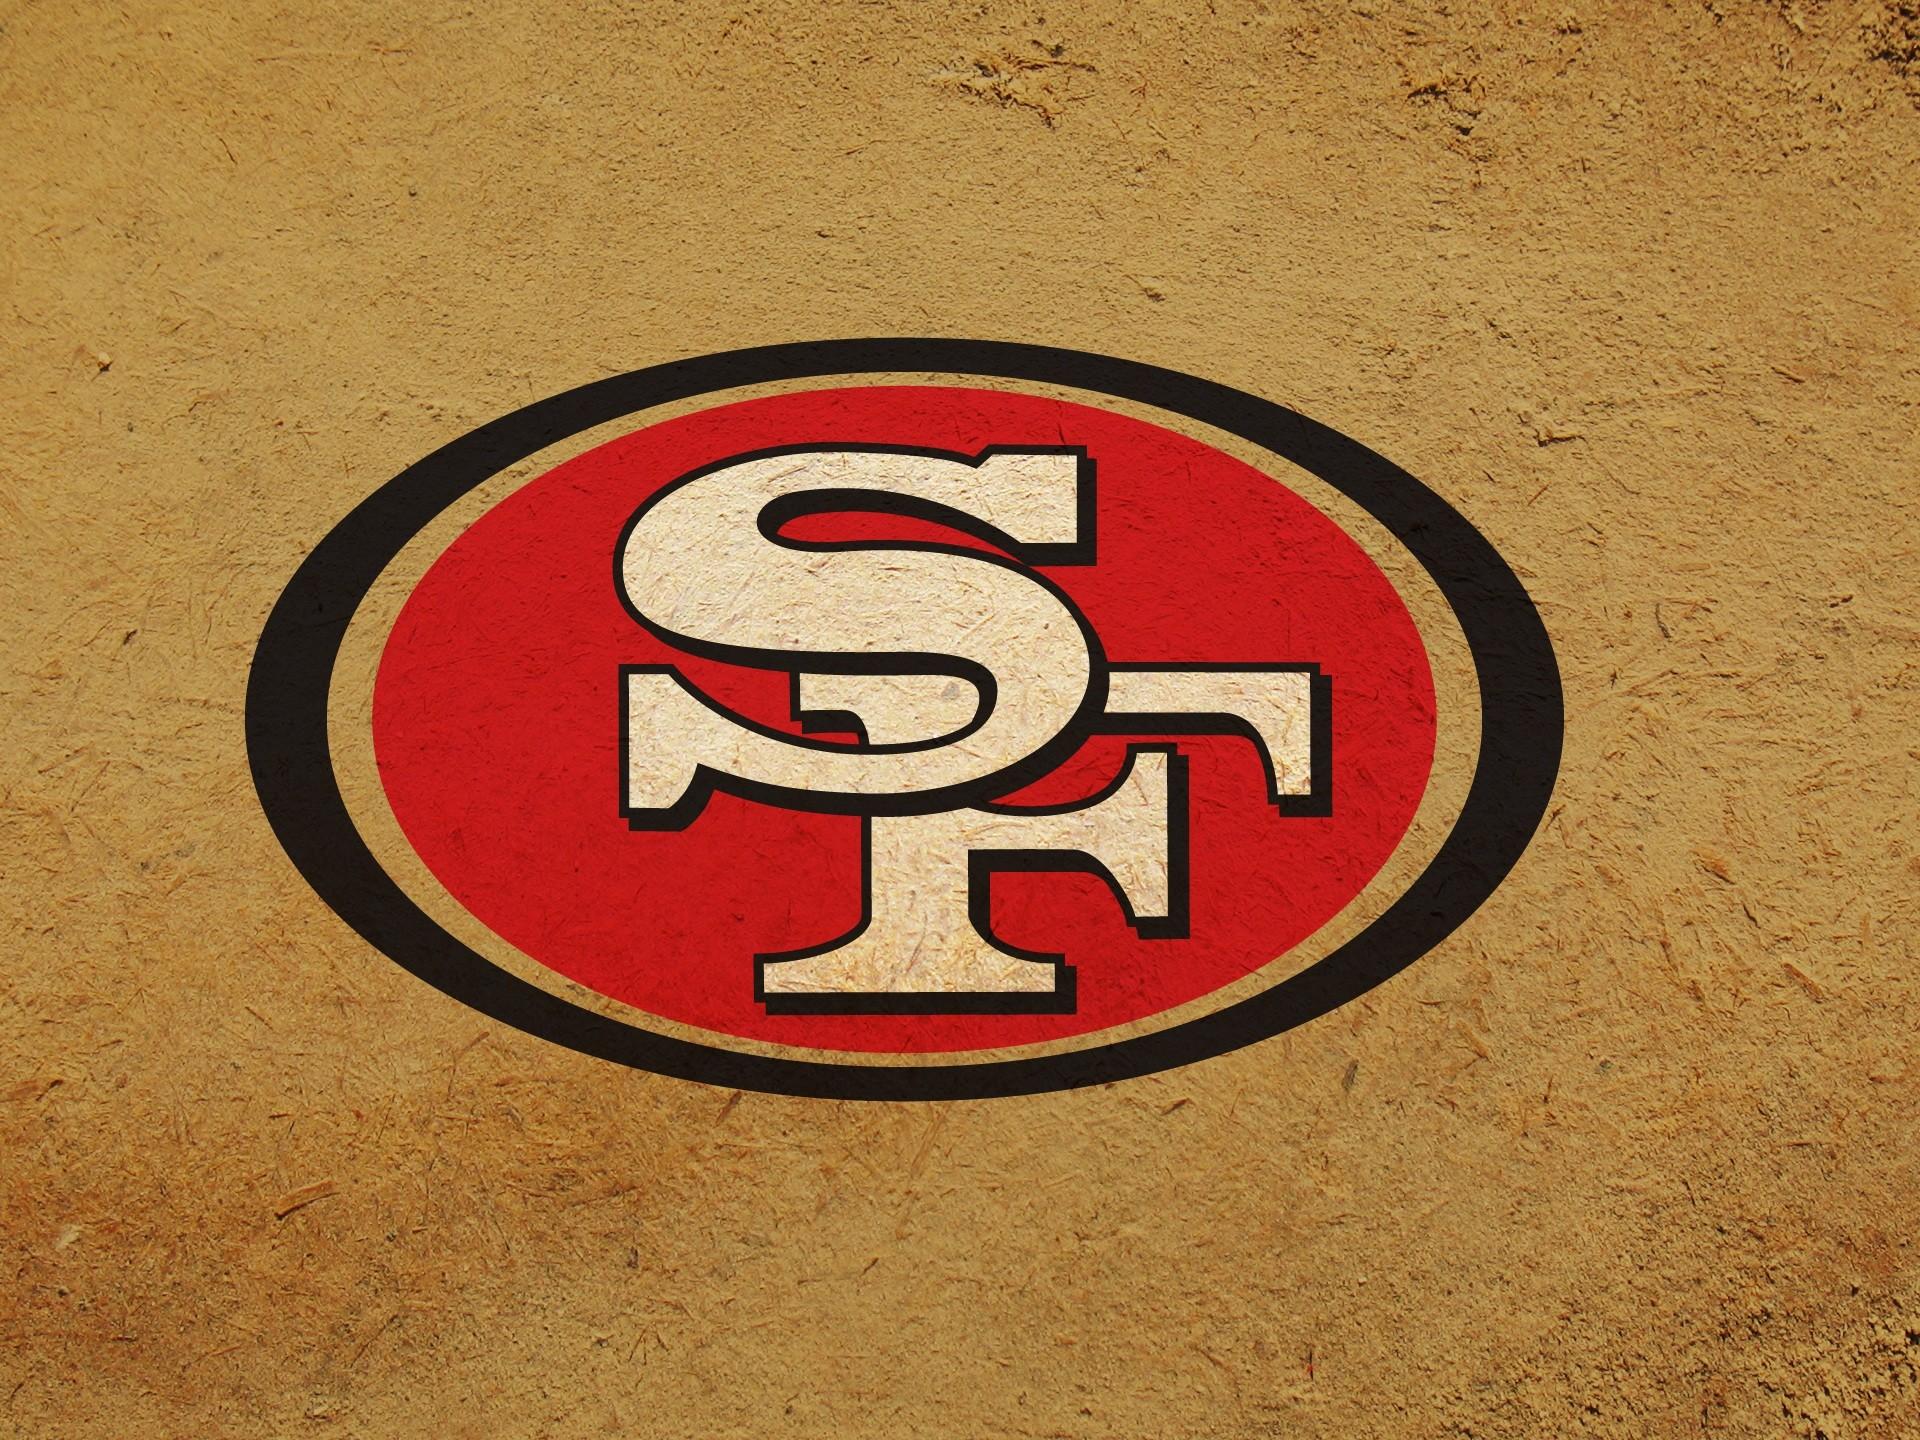 49ers Wallpaper Iphone 4 49ers Logo Wallpaper 183 ① Wallpapertag